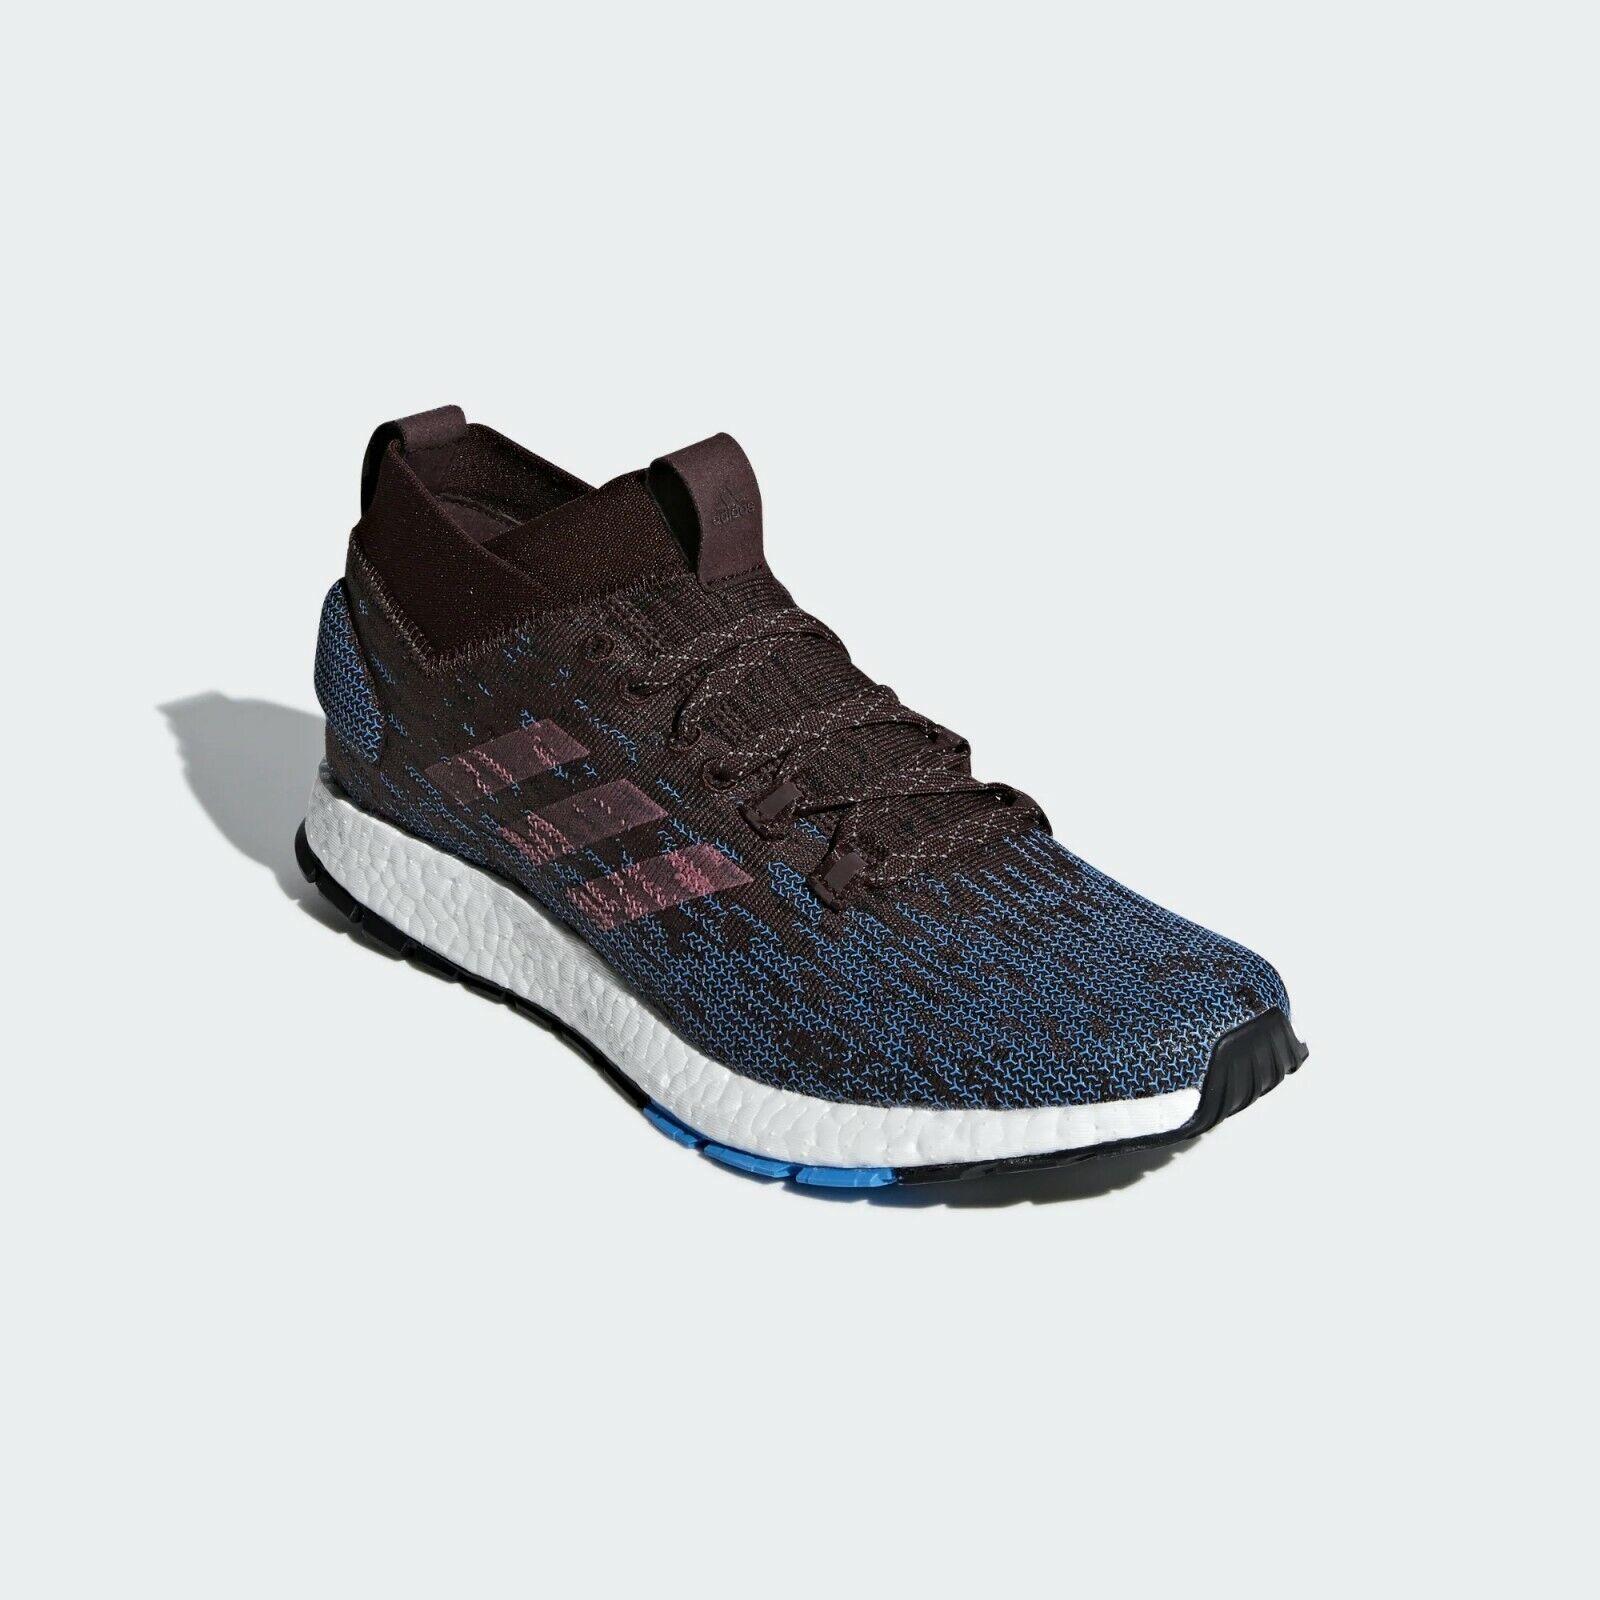 New Adidas Pureboost RBL Running scarpe CM8311 US8-10 Winter stivali stivali stivali ultraboost nmd c0eb02